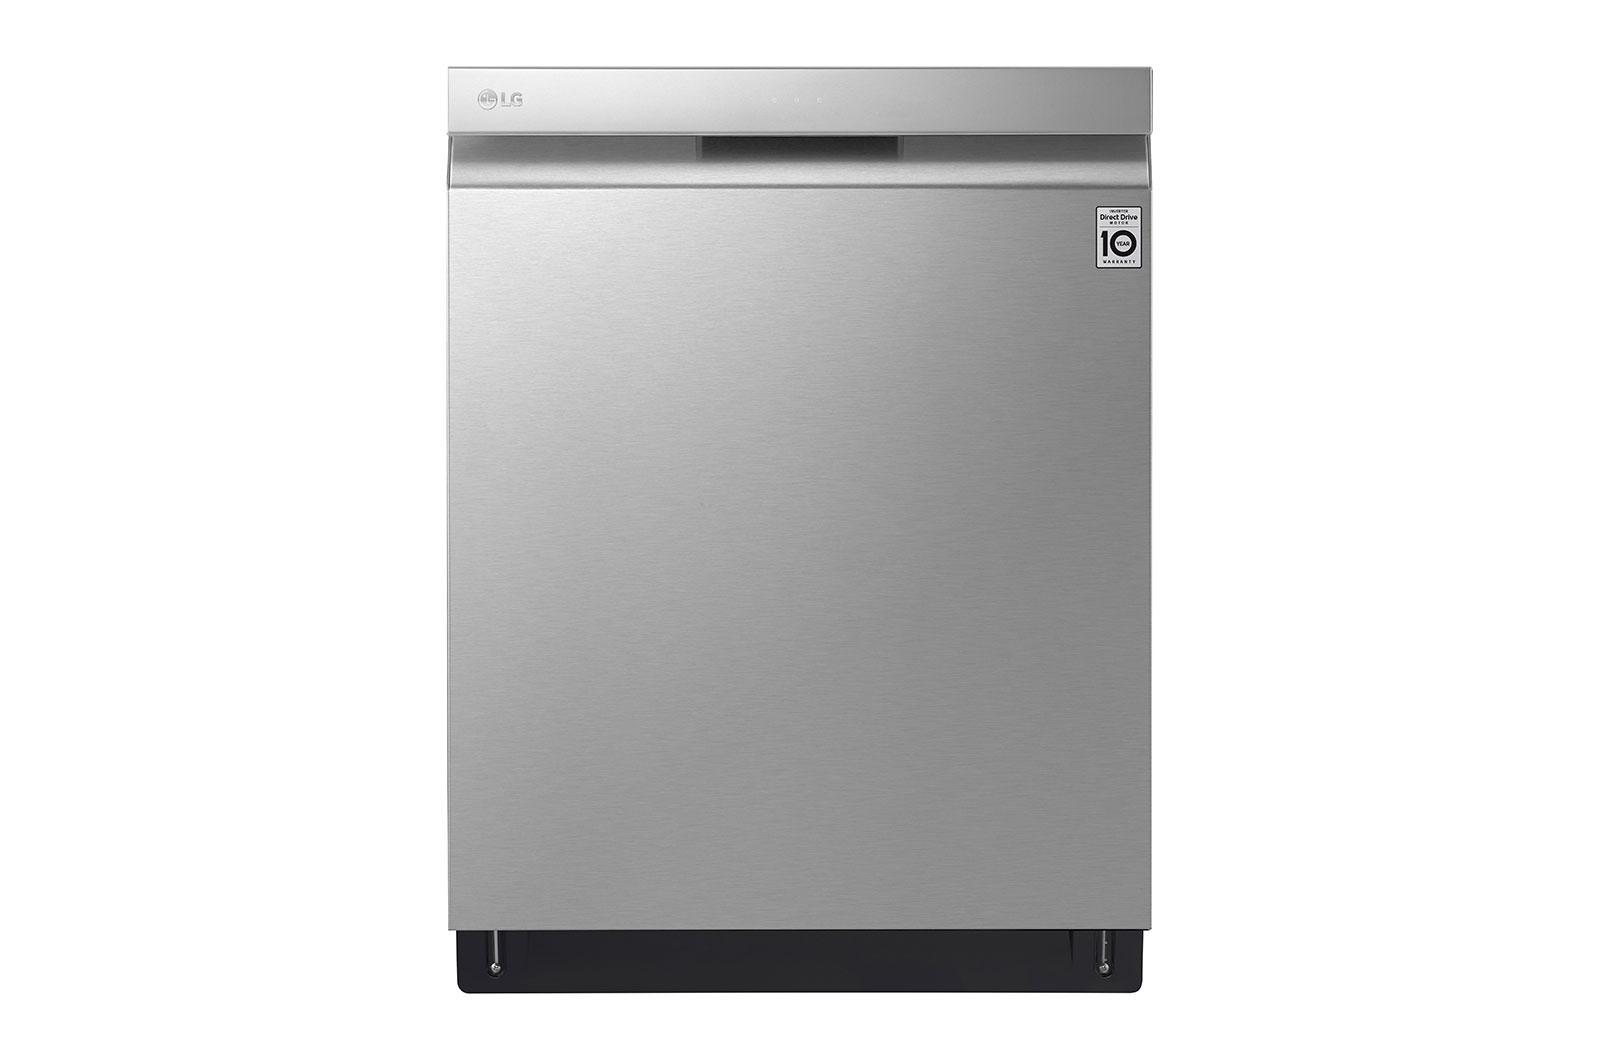 LG AppliancesTop Control Dishwasher With Quadwash™ And Truesteam®